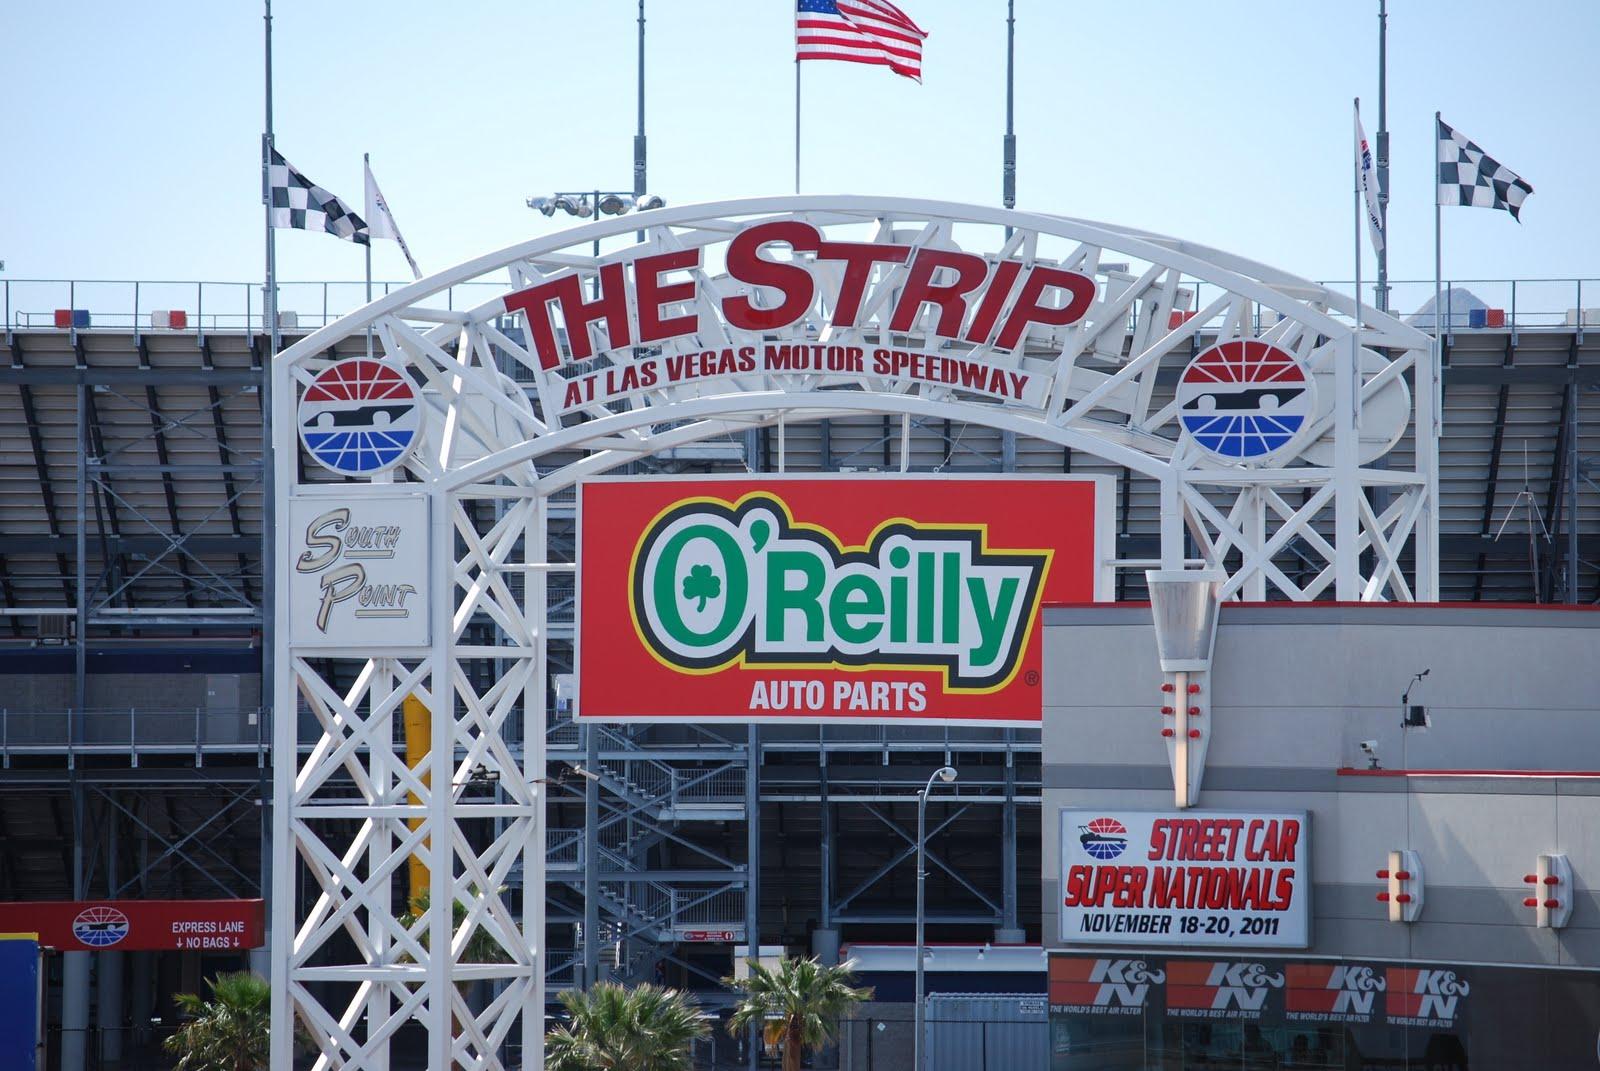 The Limo Widow Las Vegas Motor Speedway Sun Apr 3 2011